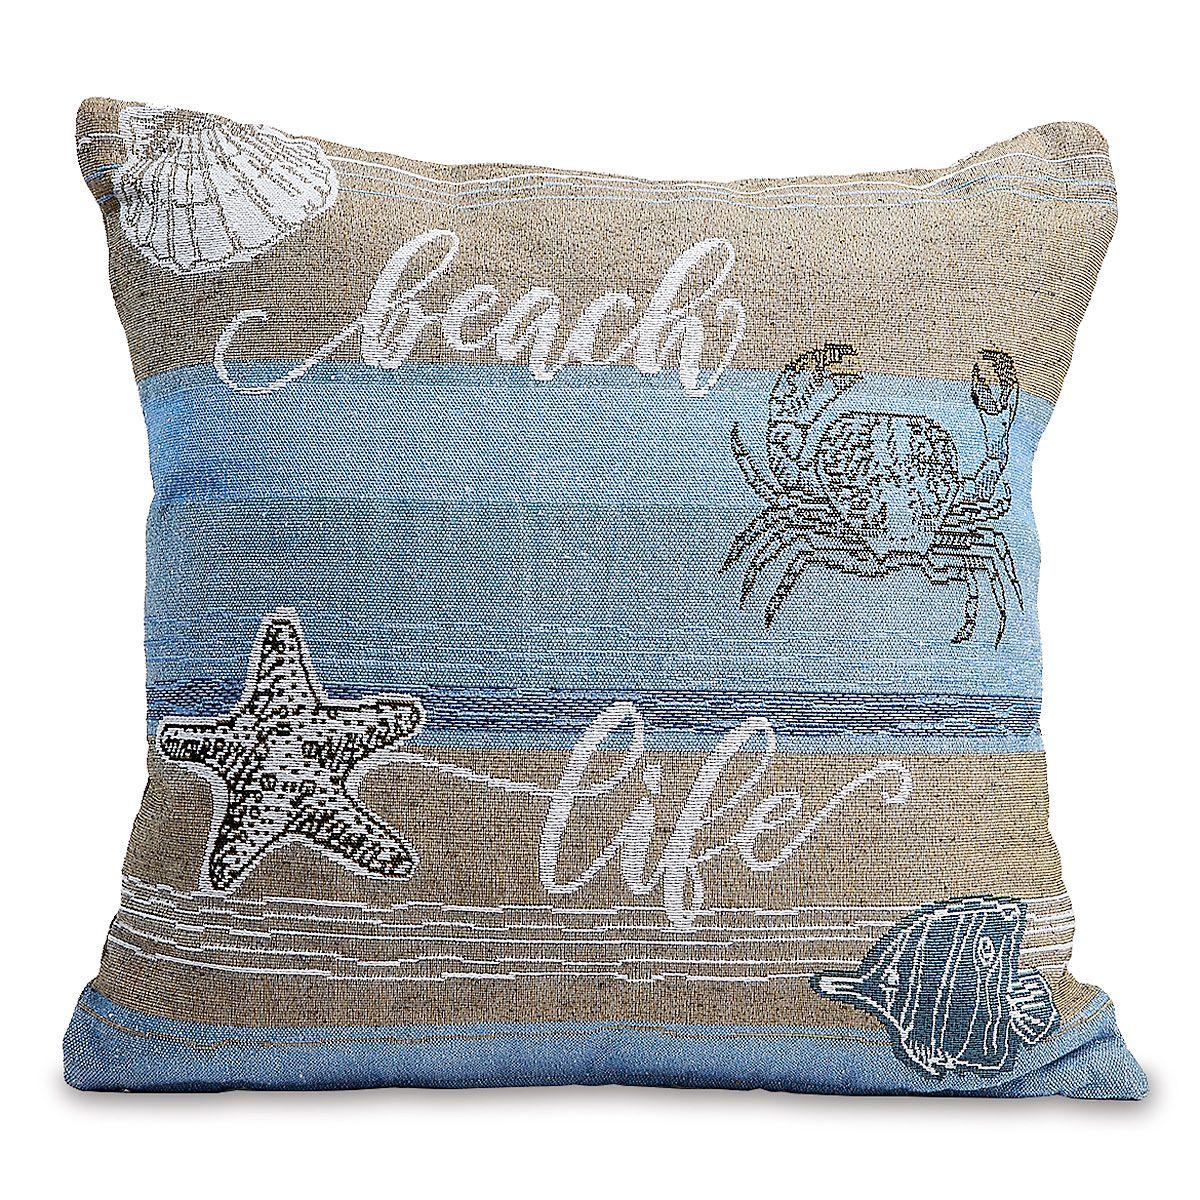 Coastal Woven Throw and Pillow